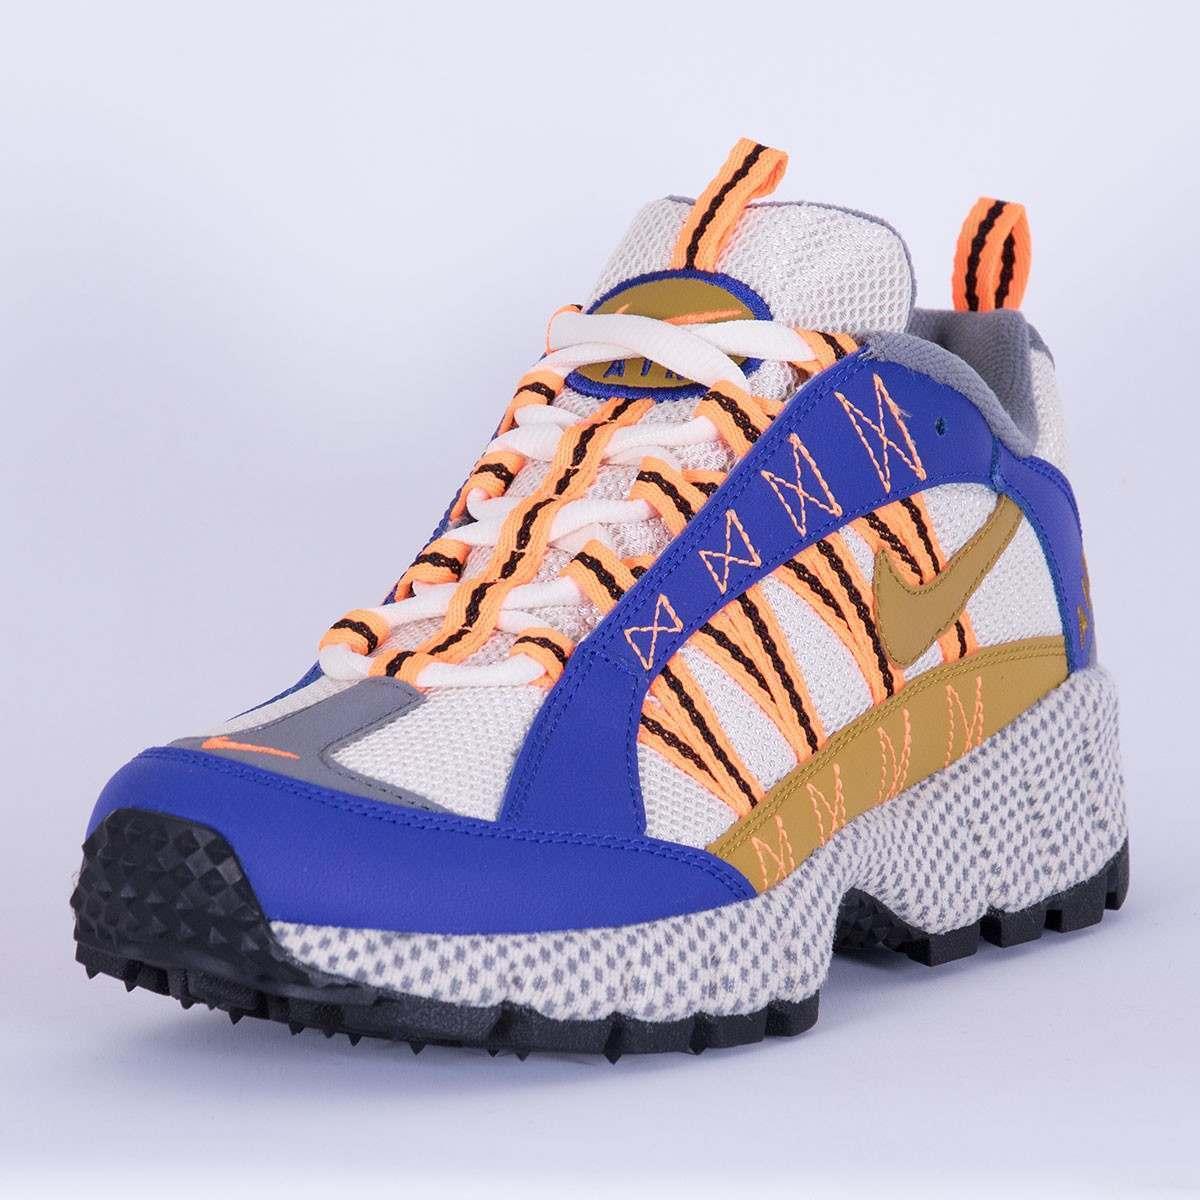 BRAND NEW DS Nike Air Humara '17 QS Concord Bronzine Cream Men's Shoes size 10.5